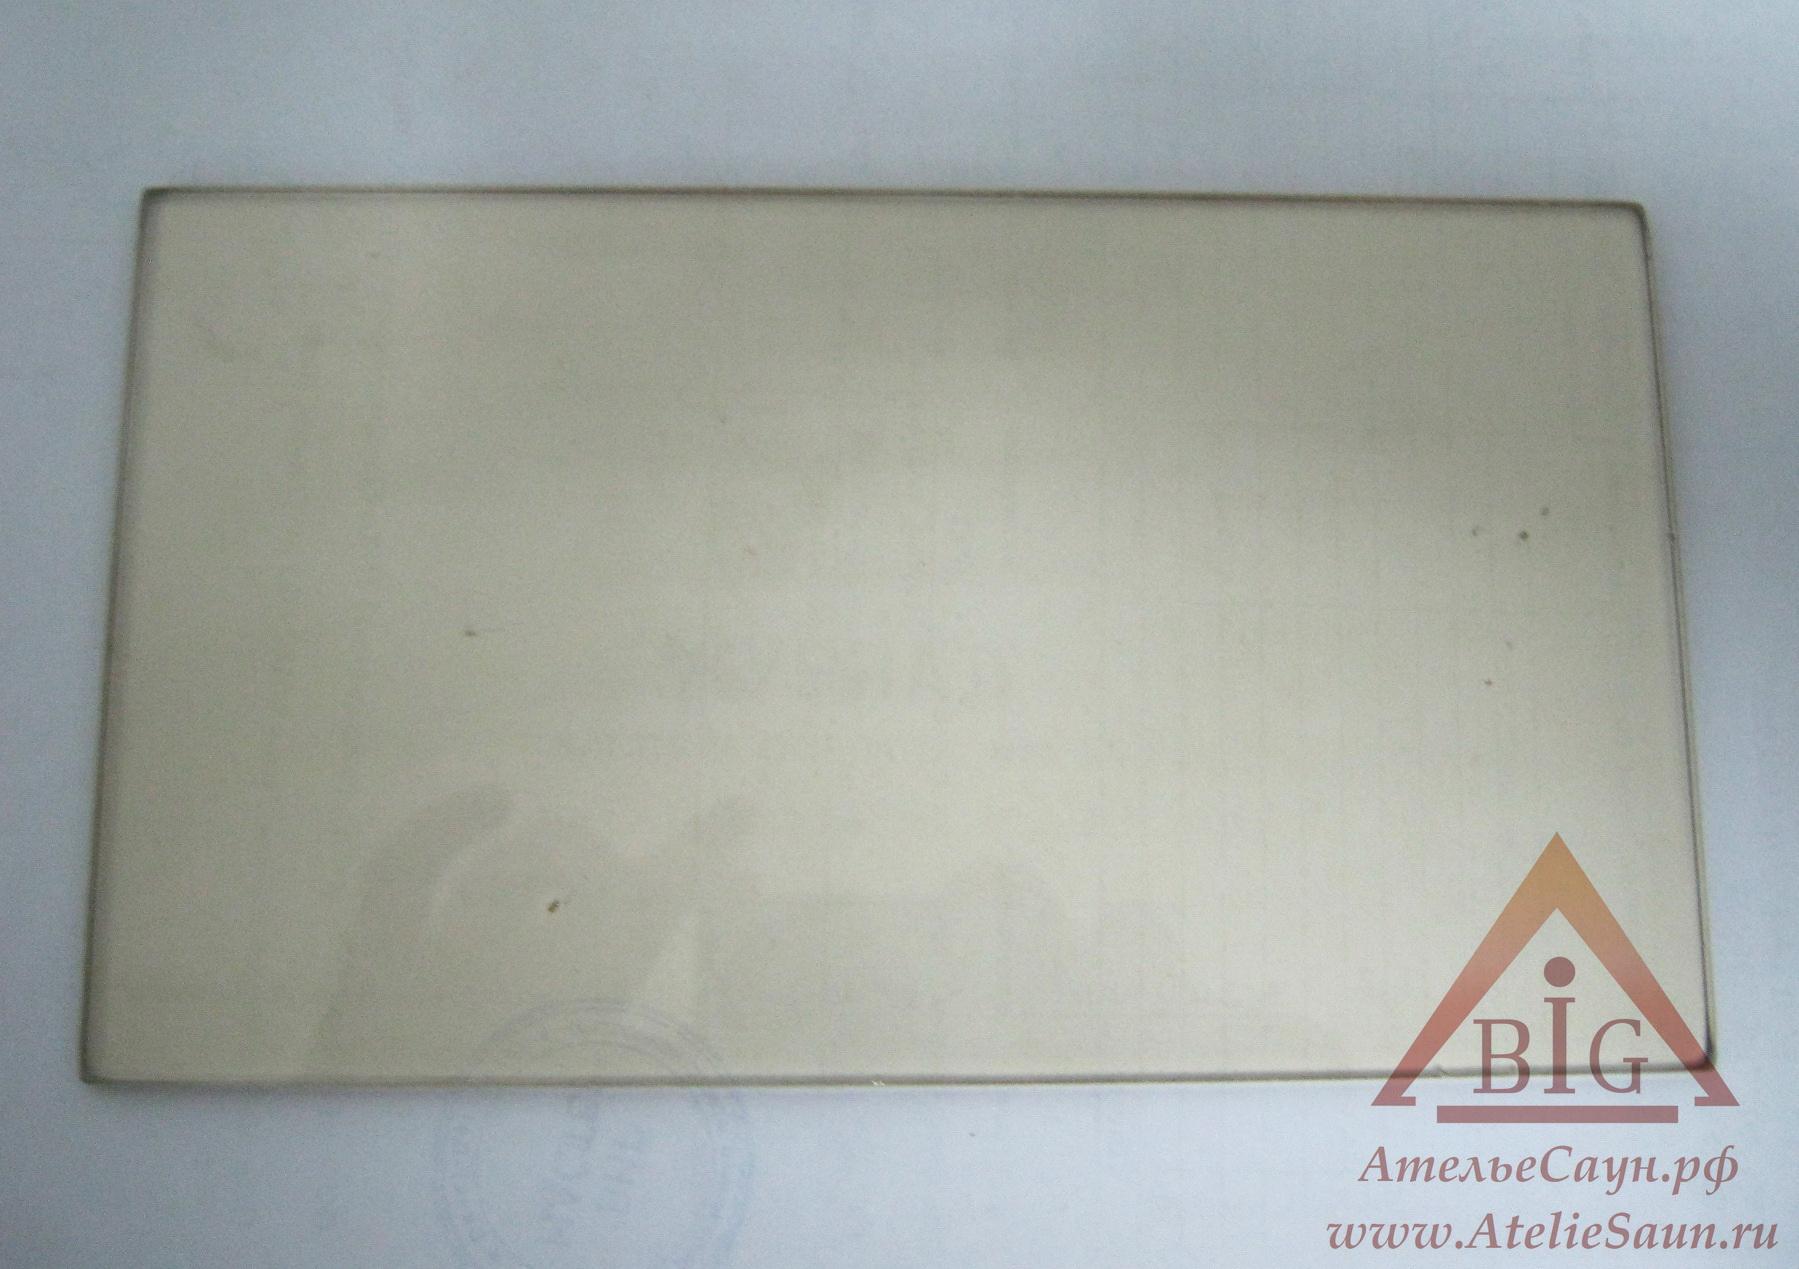 Стекло для печей Harvia Pro (11,3х19,8 см), ZTS-38